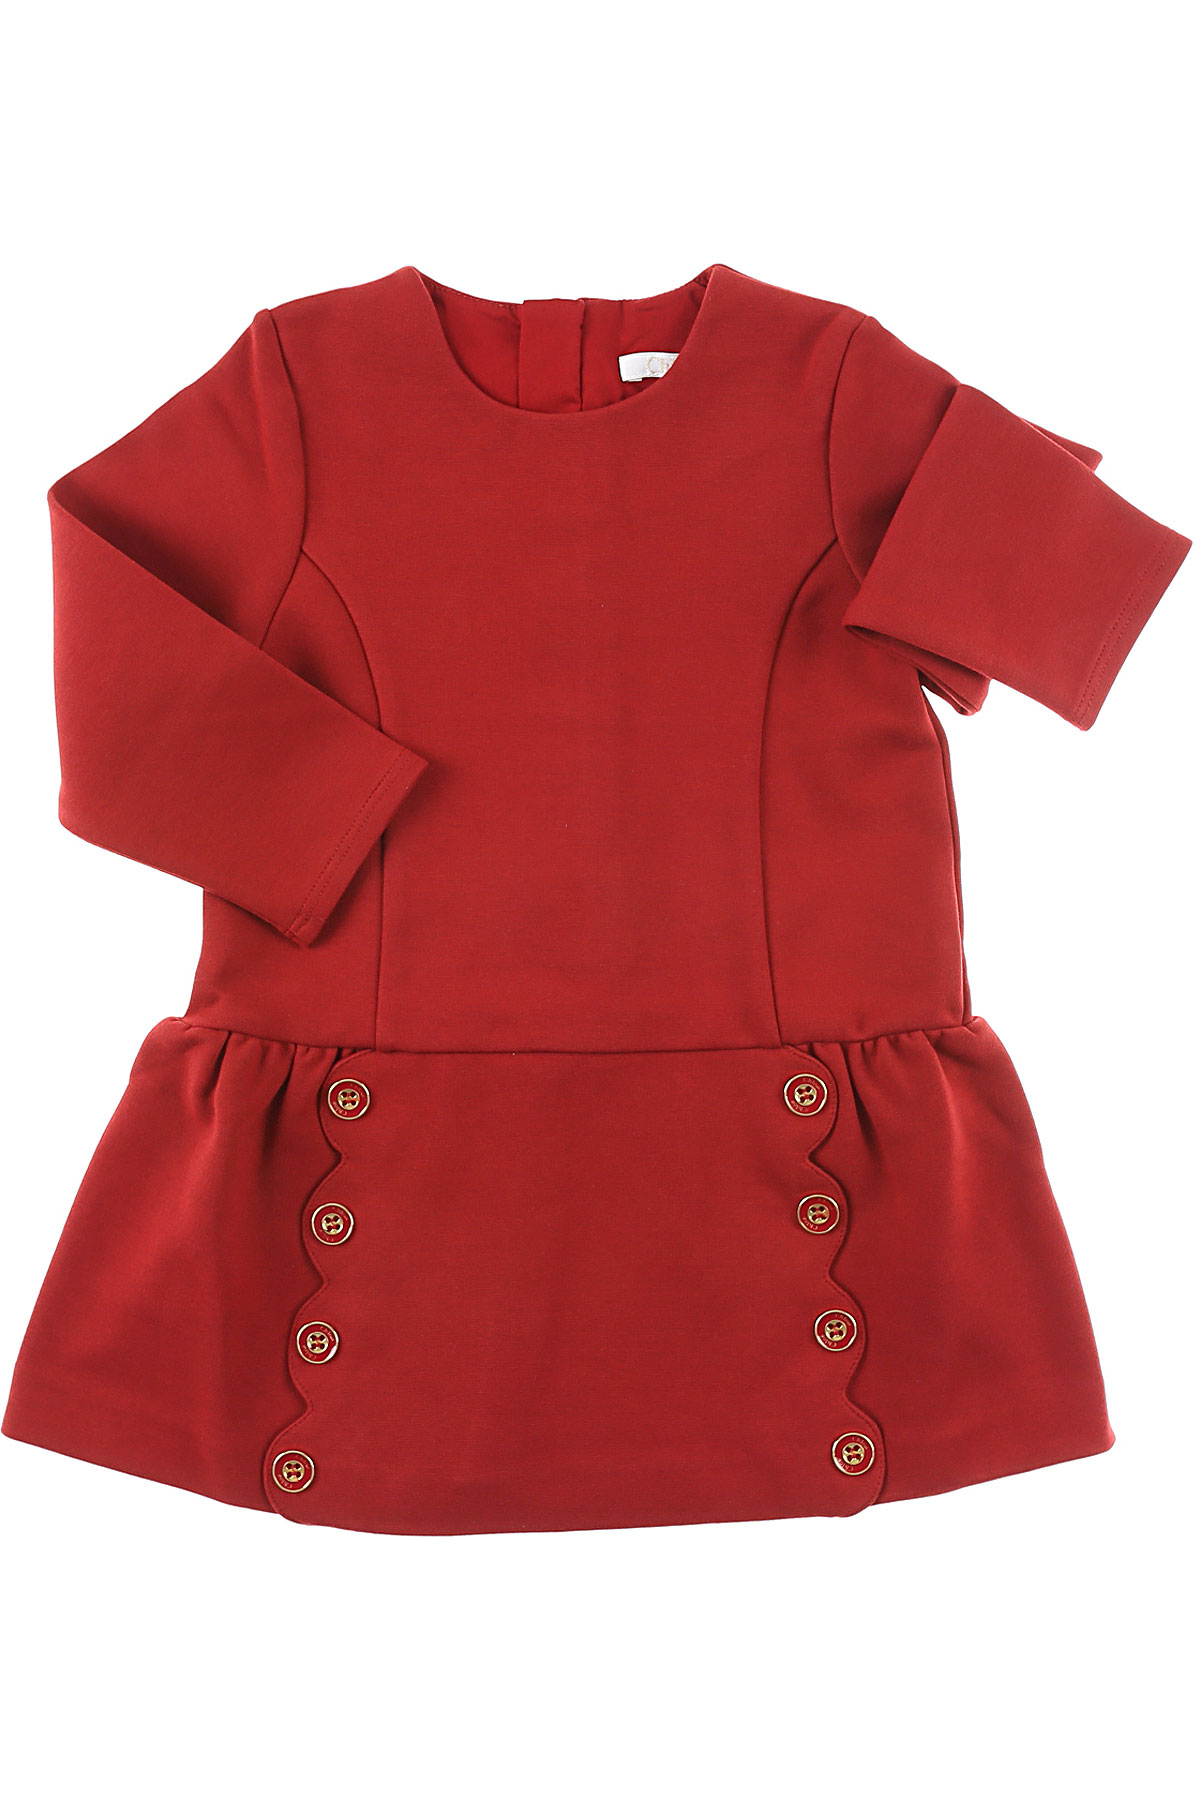 Image of Chloe Baby Dress for Girls, Amaranth, Cotton, 2017, 12M 18M 2Y 3Y 6M 9M